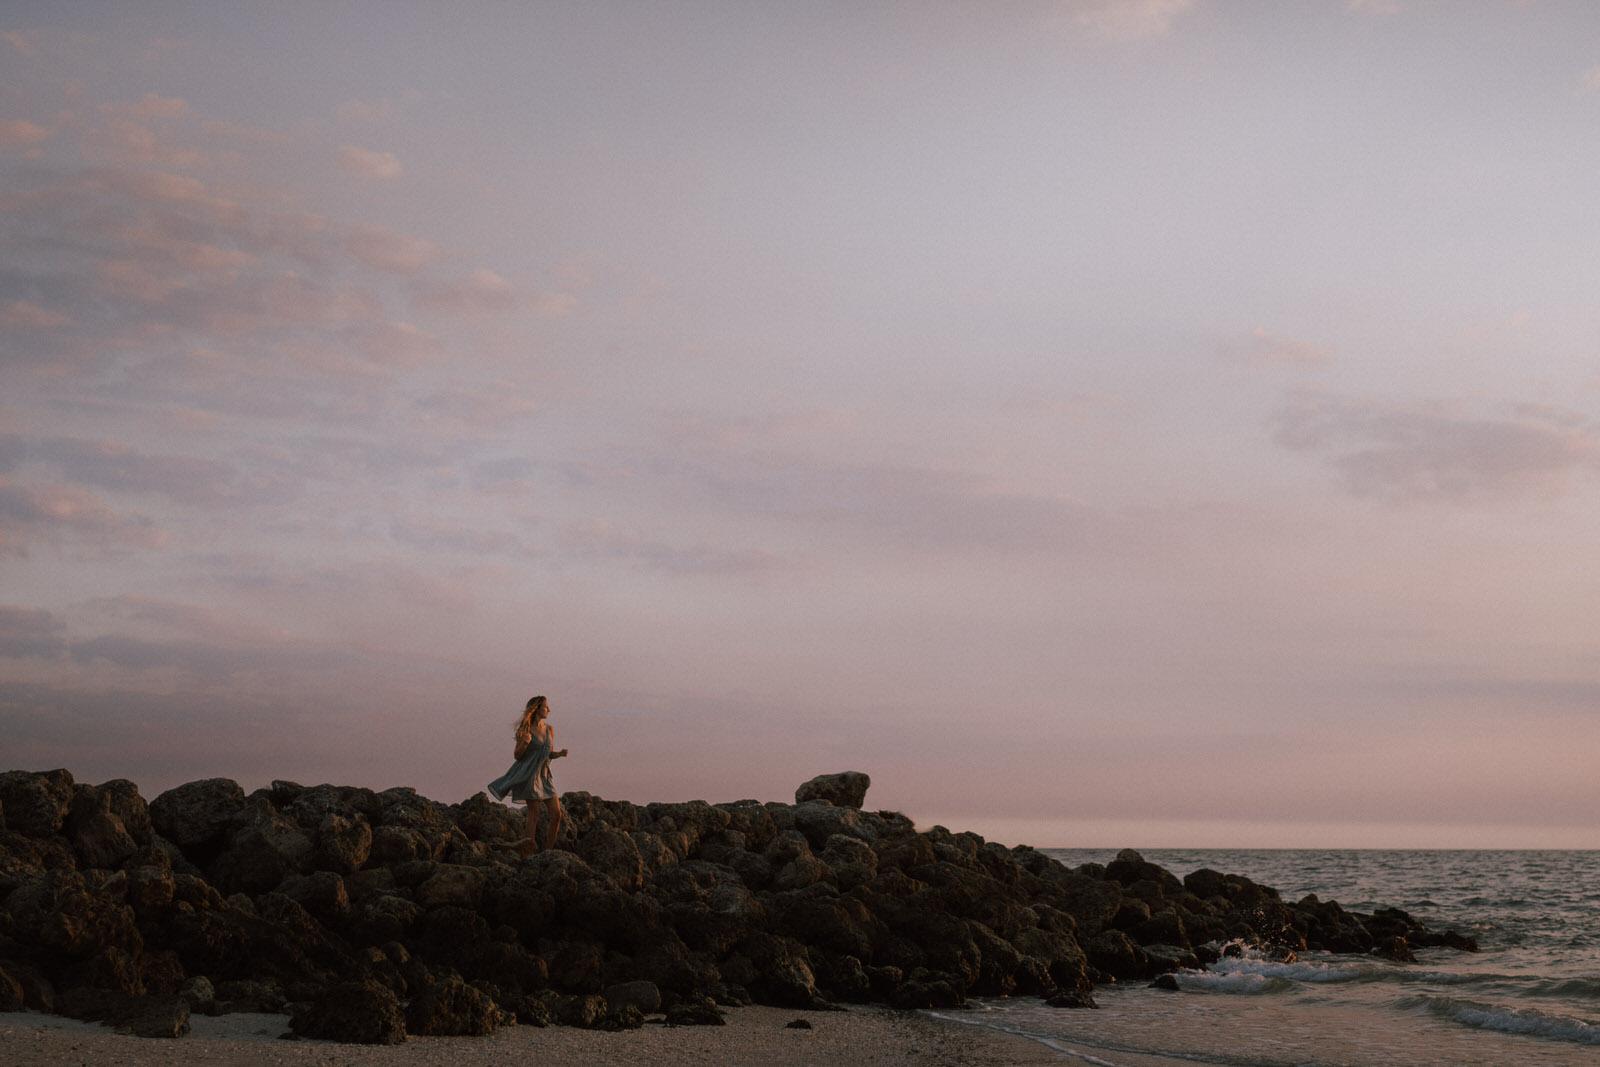 Fort Myers Senior Photos on Bonita Beach - Michelle Gonzalez Photography - Sammie-166.JPG